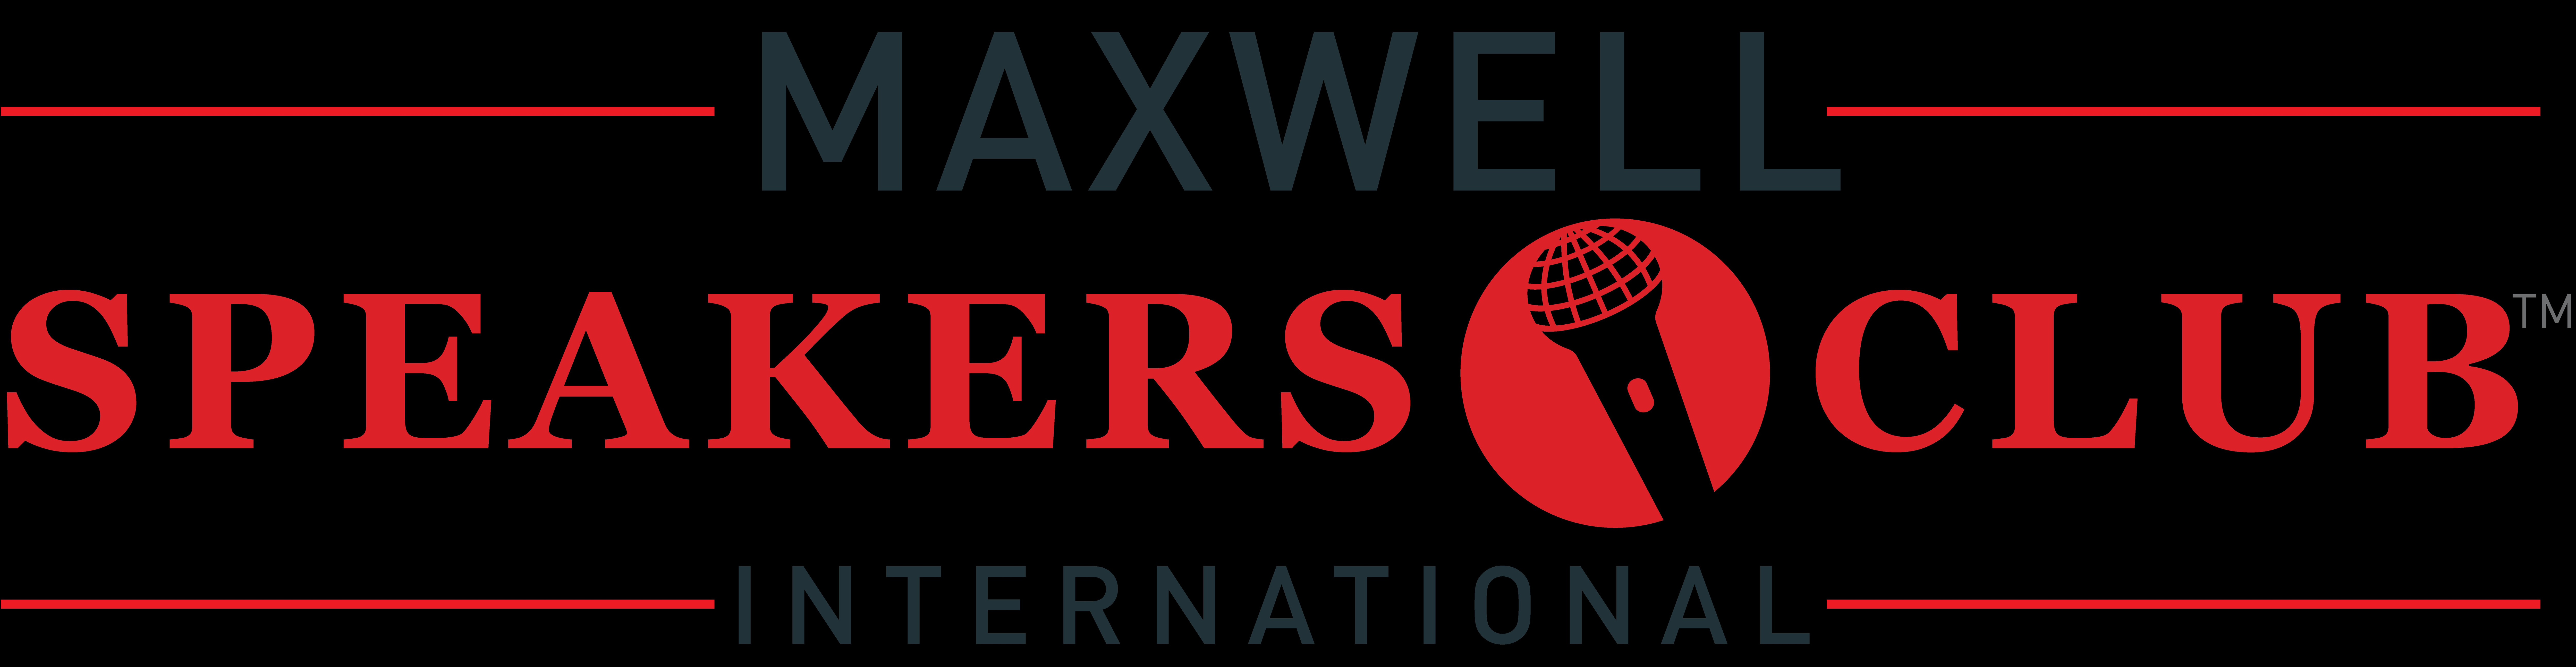 Maxwell_Speaker_Club_Logo_TM